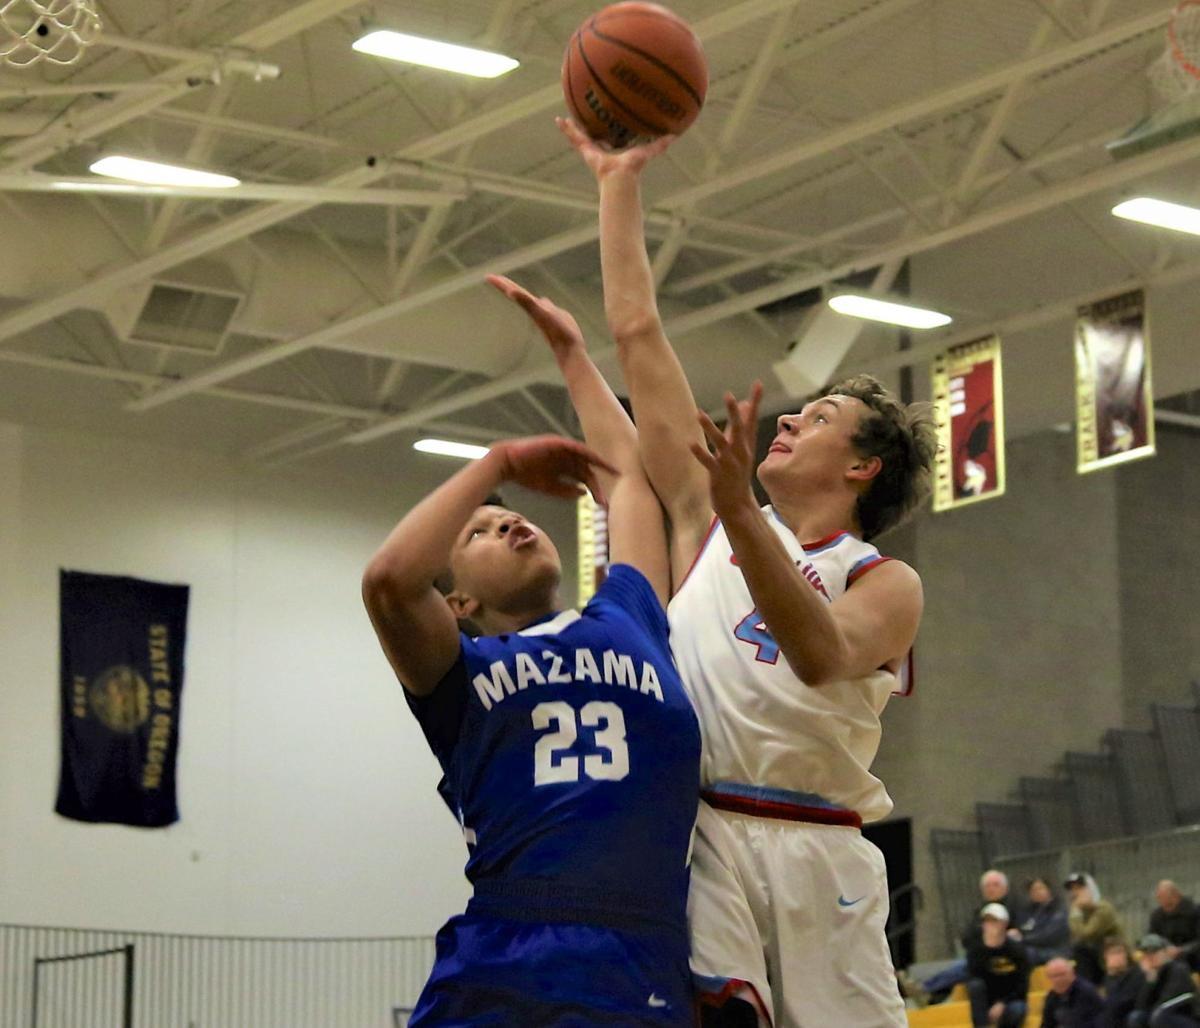 Boys basketball: Seaside reaches Final Four with win over Mazama